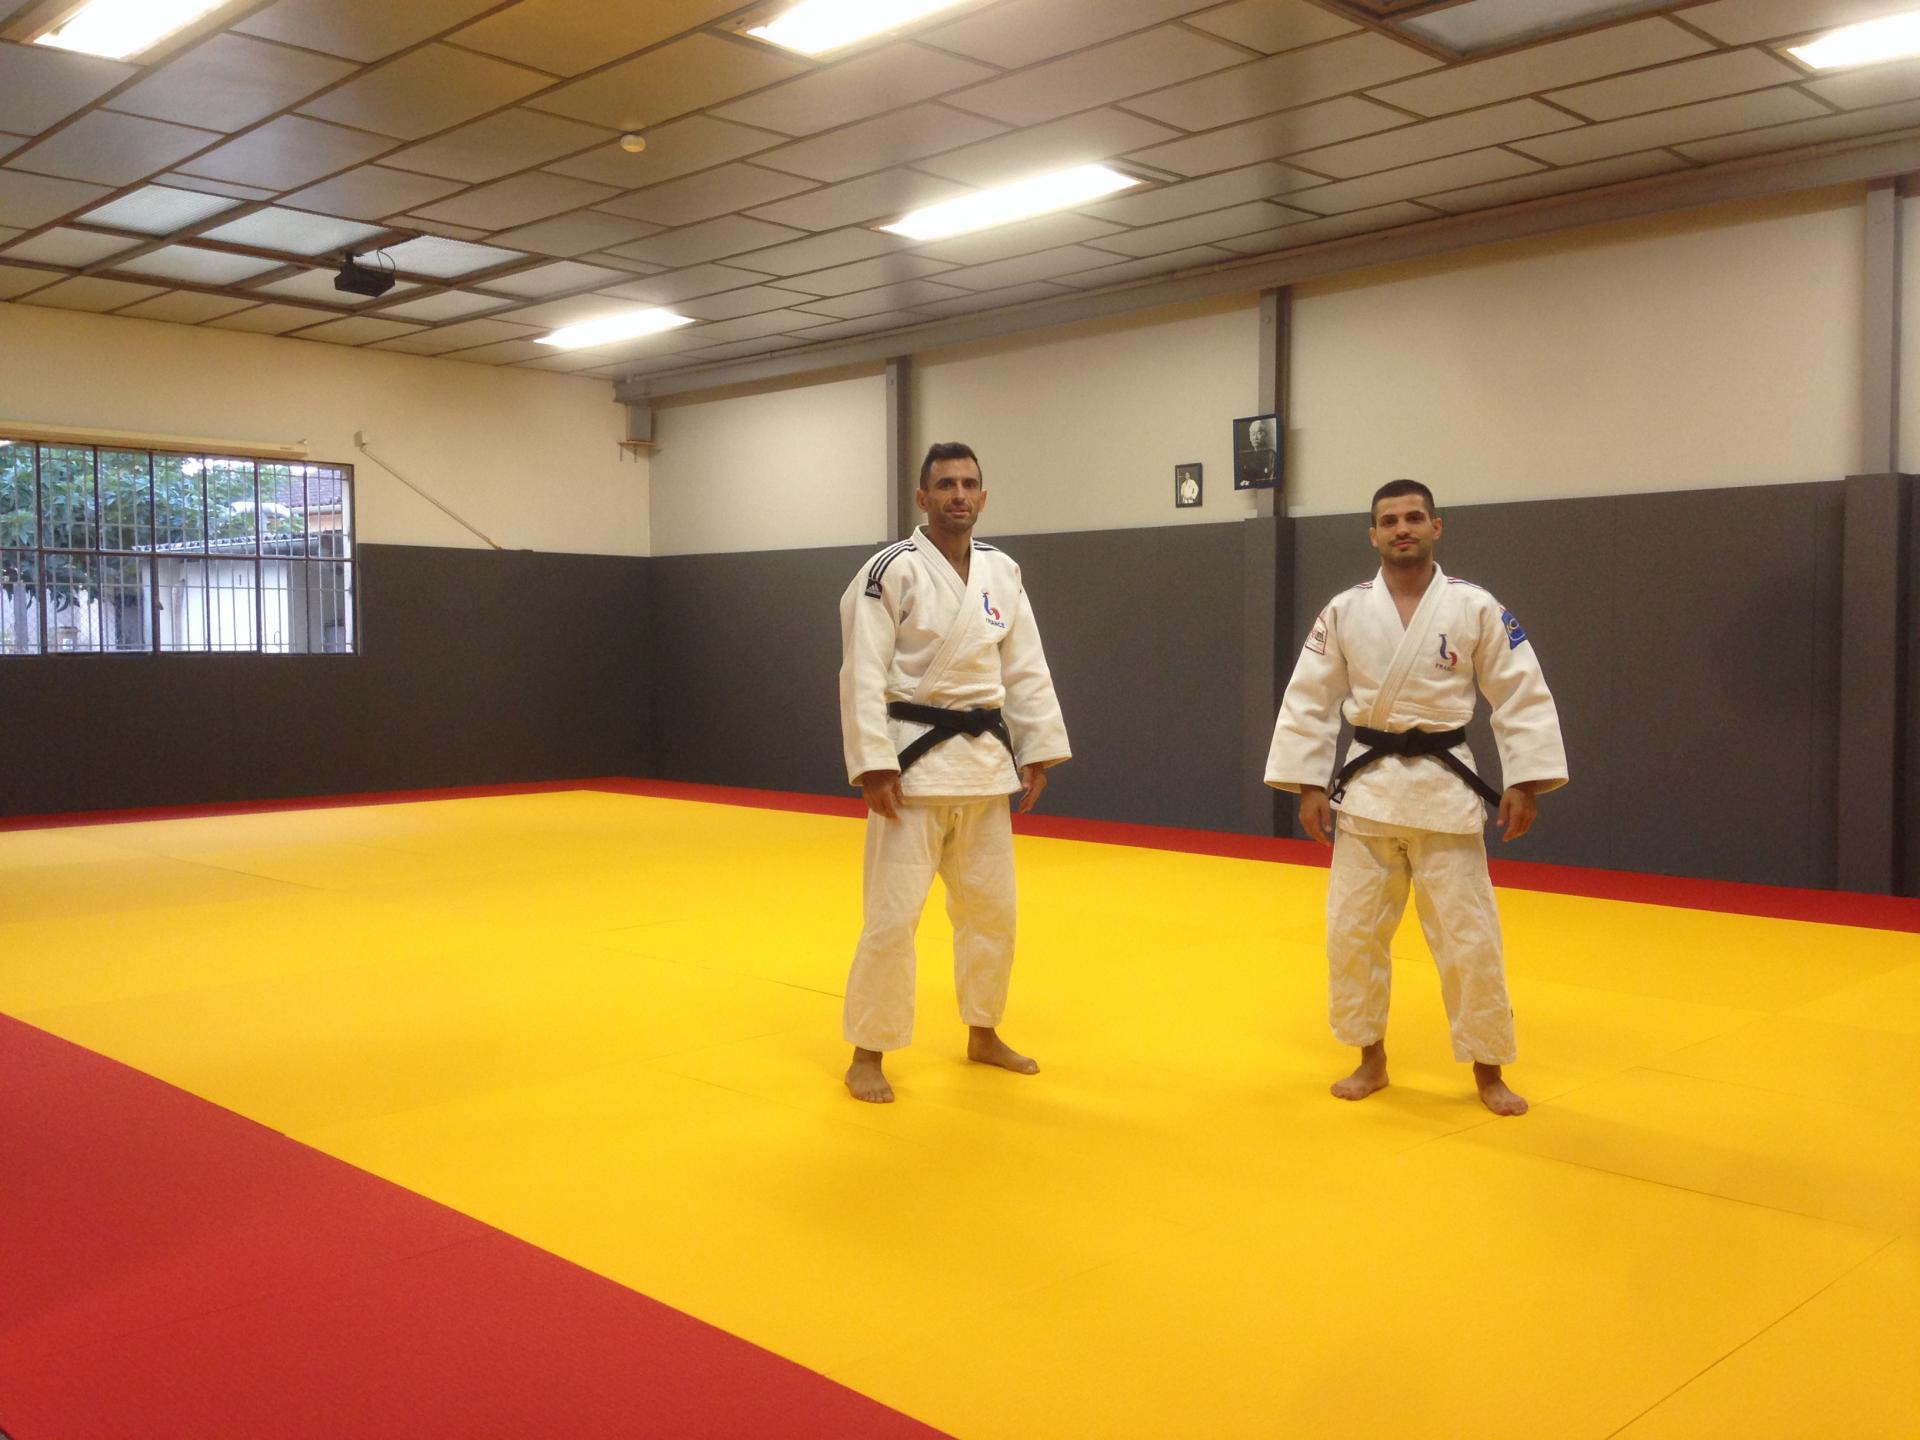 Stéphane Bega (à gauche) et Grégory Marques (à droite)